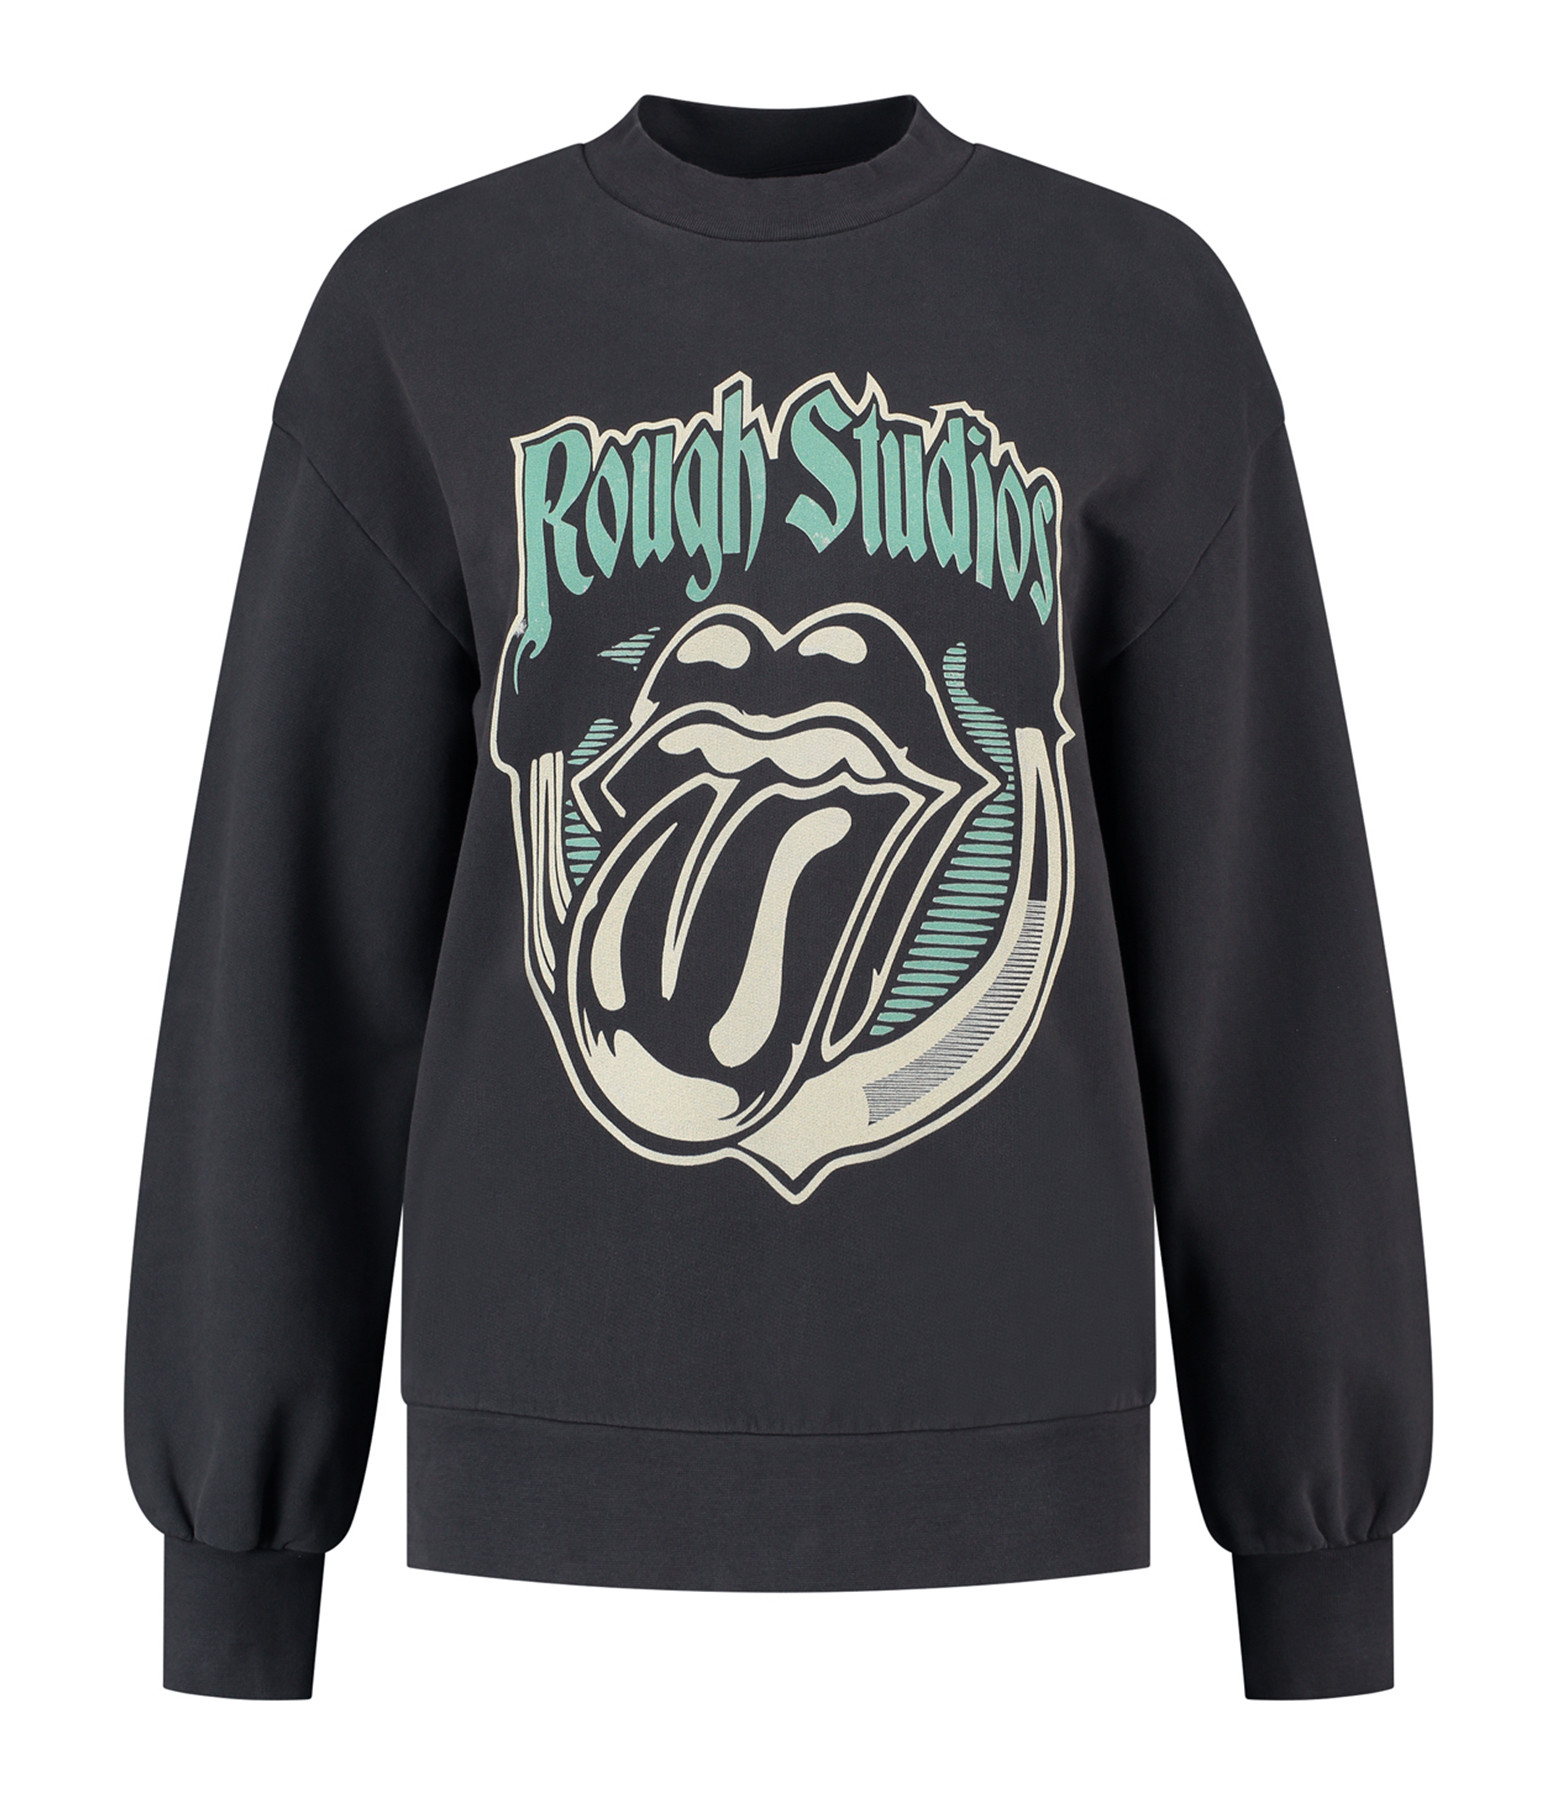 ROUGH STUDIOS - Sweatshirt Iman Coton Gris